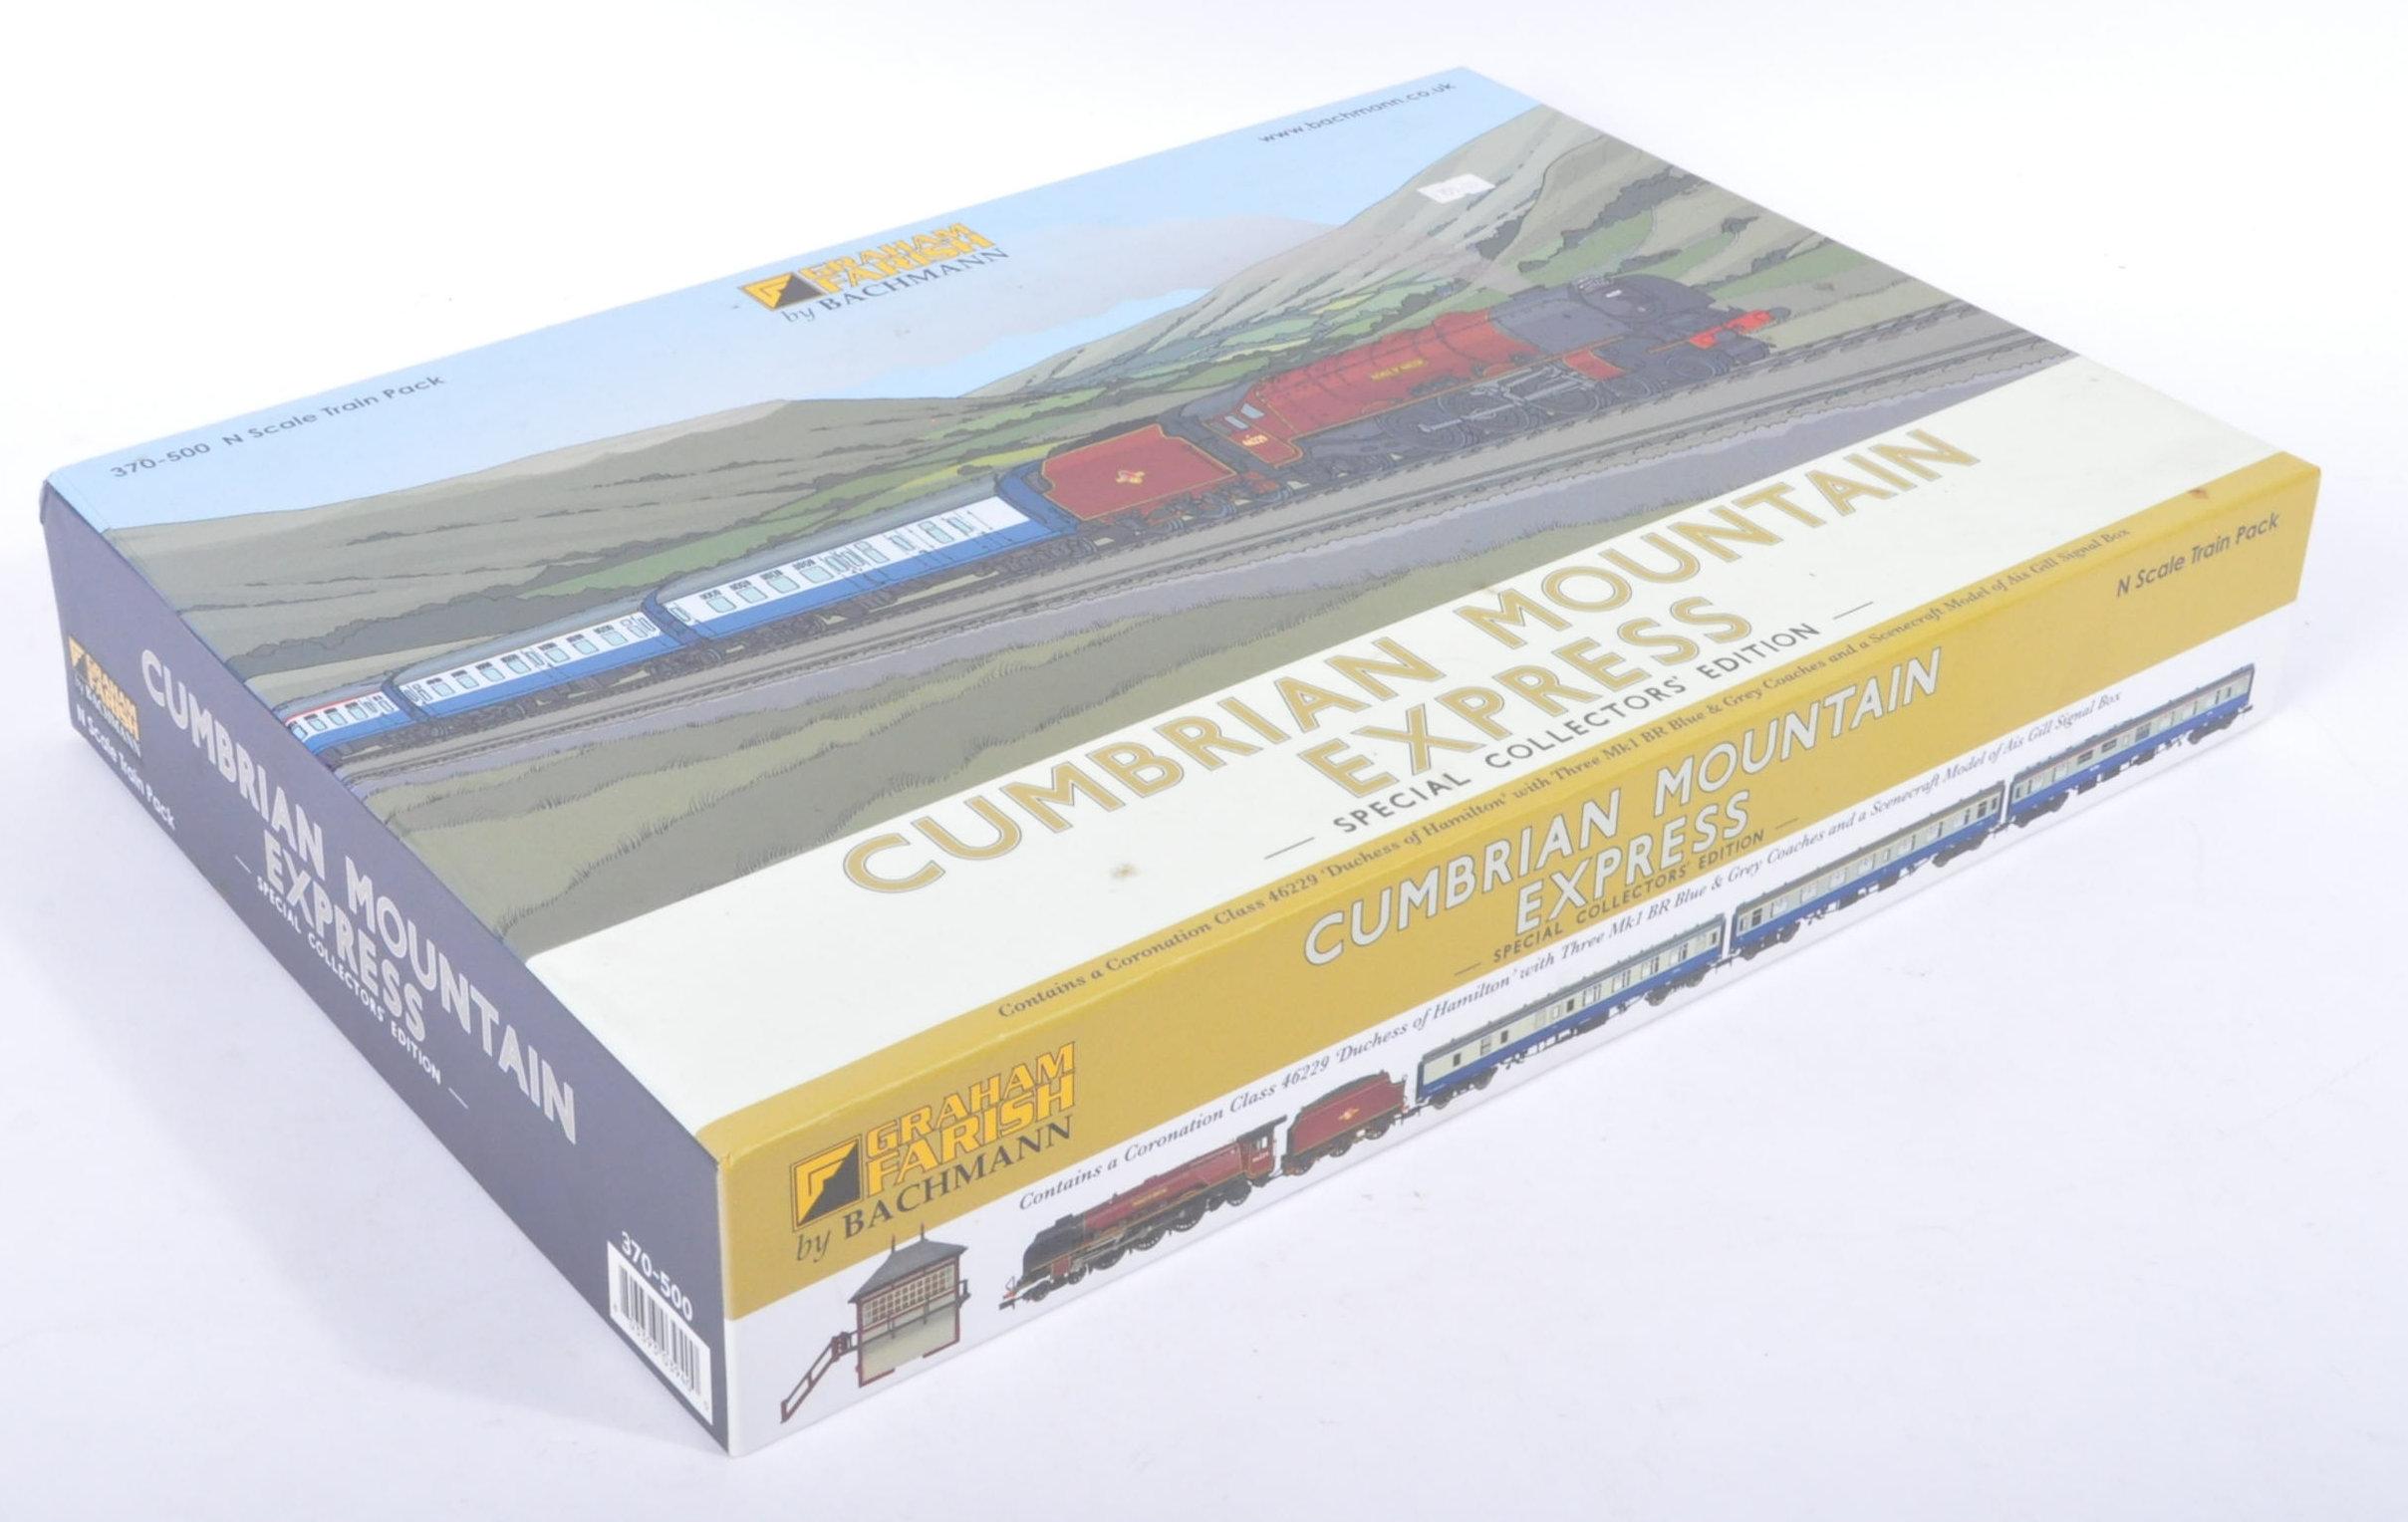 ORIGINAL BOXED GRAHAM FARISH CUMBRIAN MOUNTAIN EXPRESS TRAINSET - Image 8 of 9